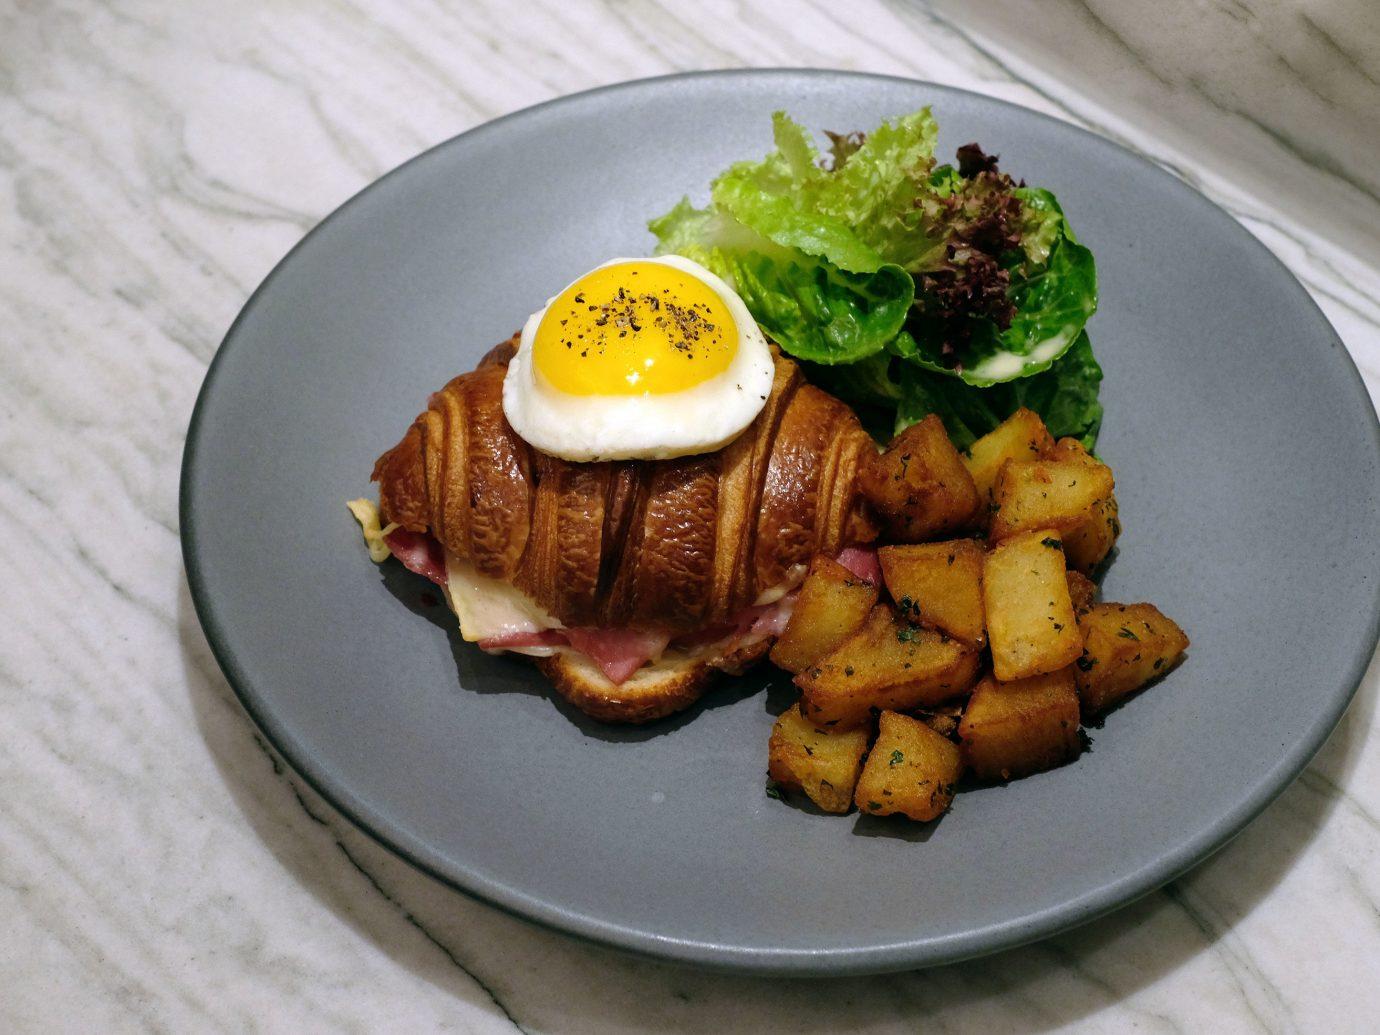 Food + Drink plate food table dish meal meat breakfast produce cuisine vegetarian food lunch restaurant vegetable piece de resistance